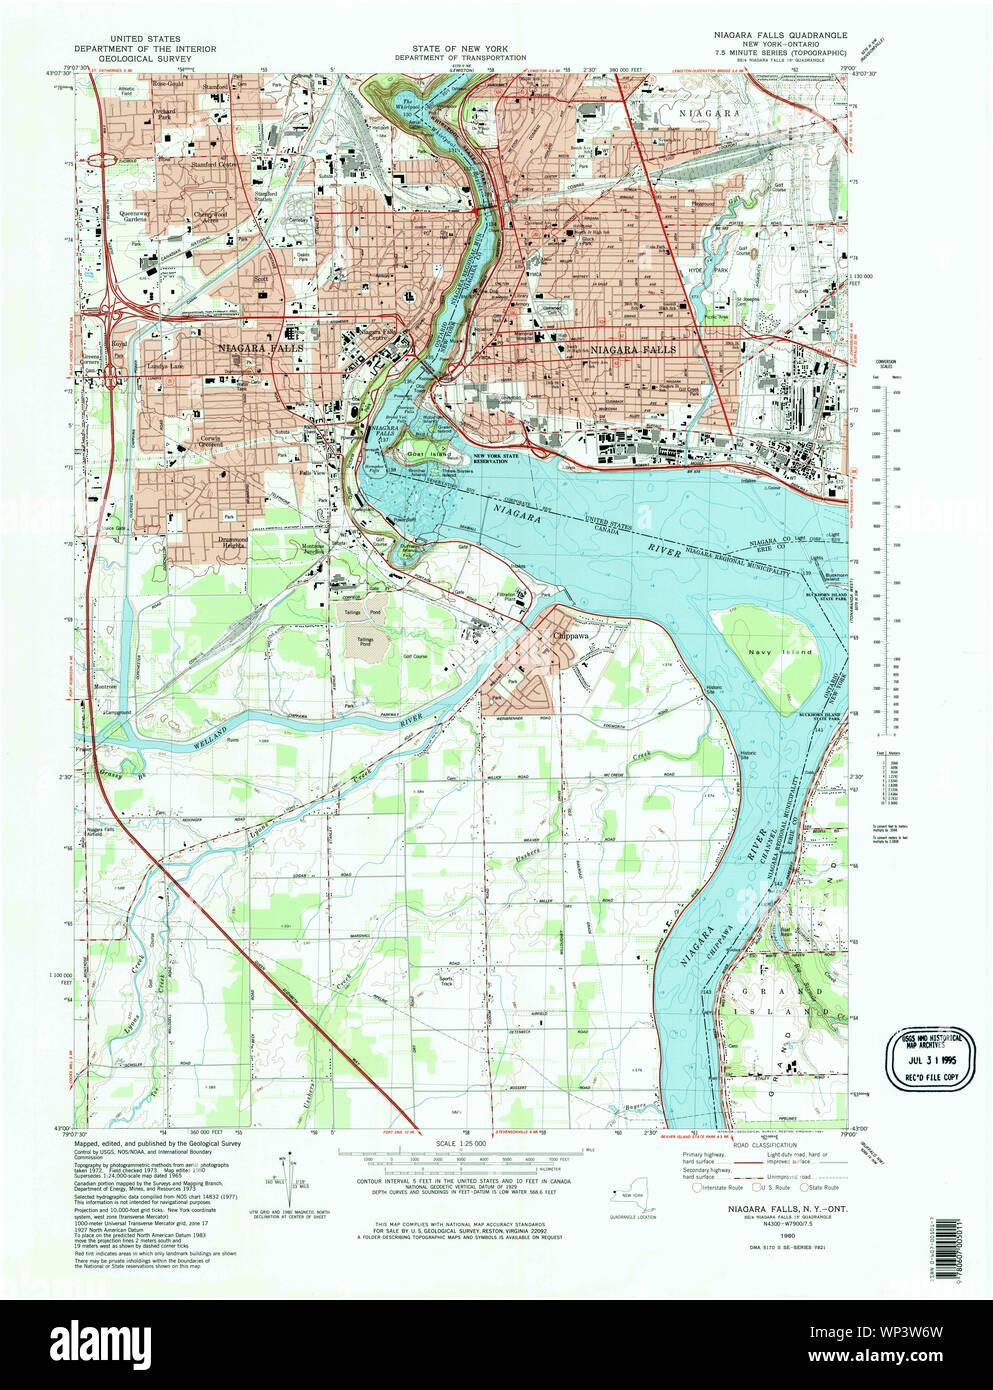 New York Ny Niagara Falls 130855 1980 25000 Restoration